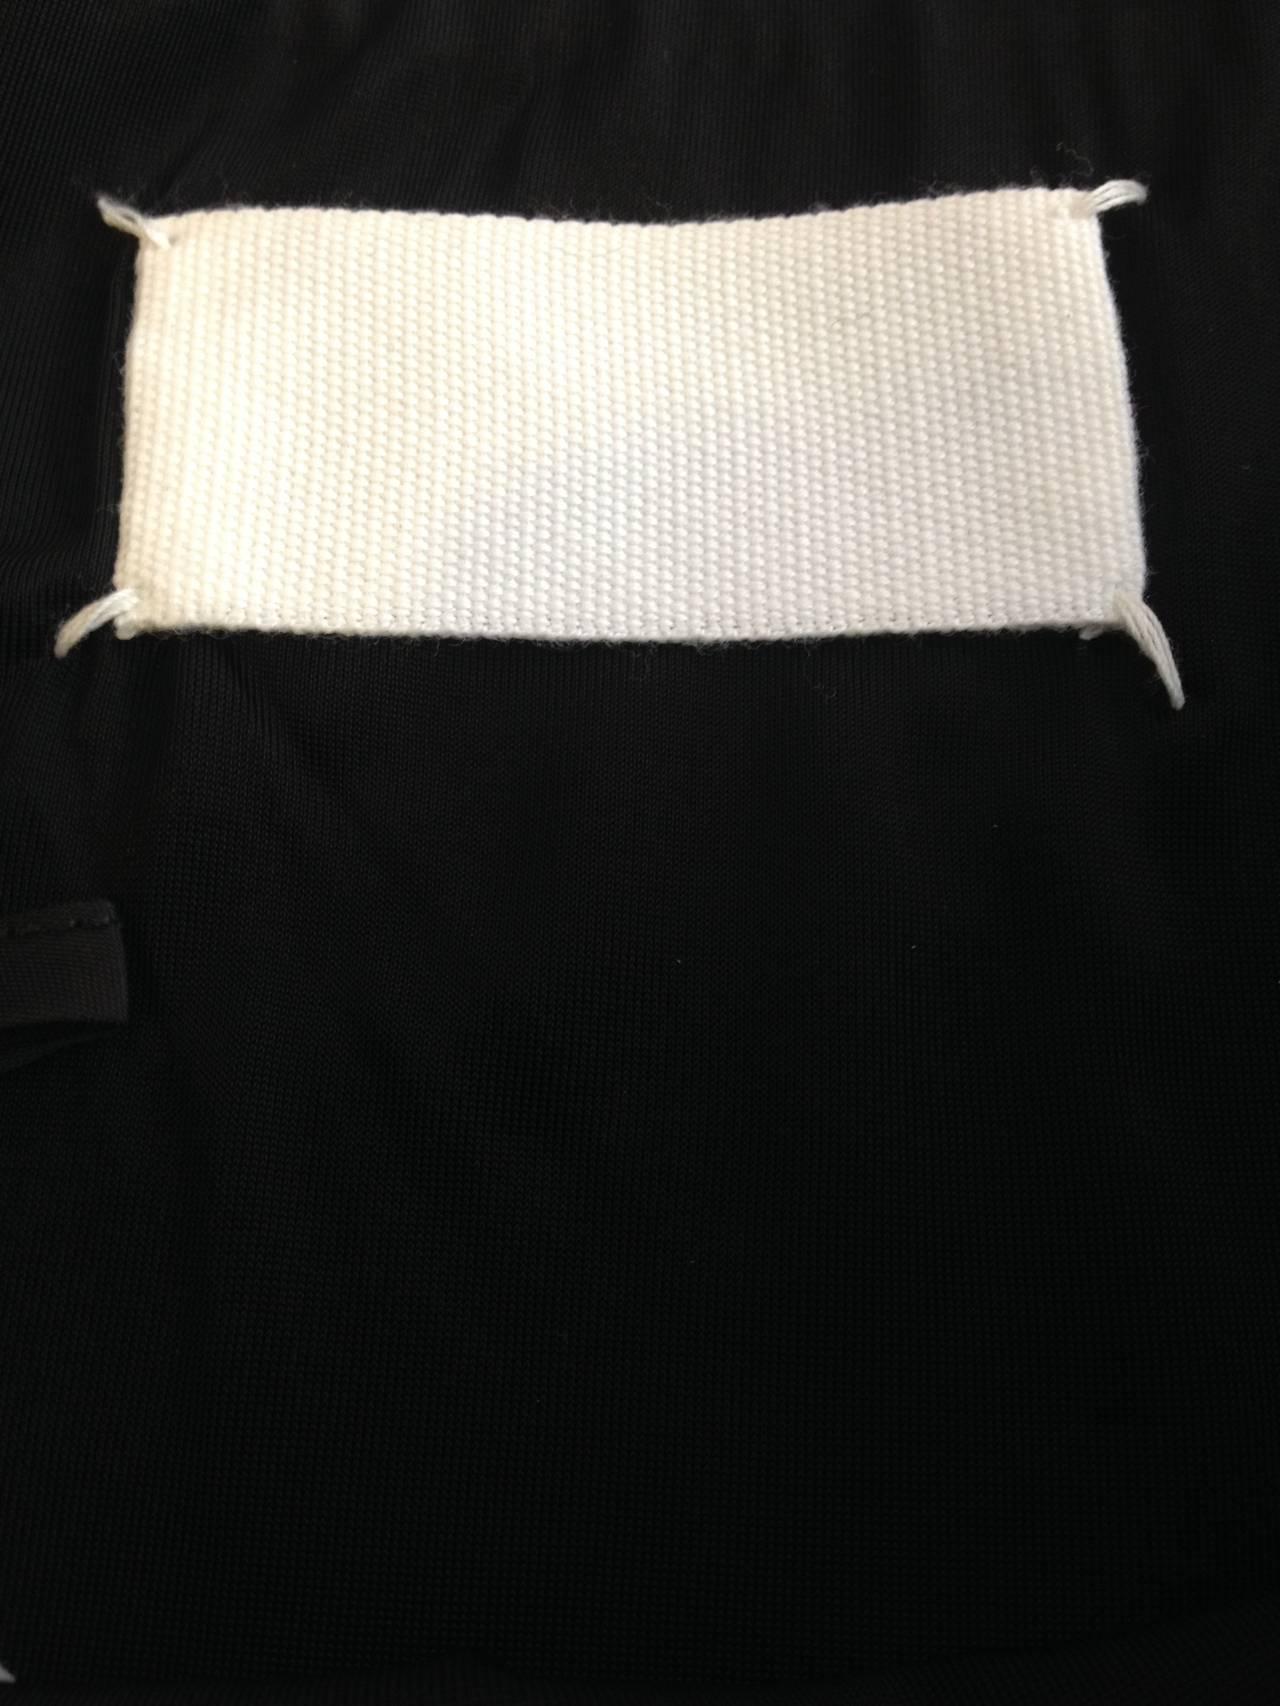 Maison Martin Margiela Black Zippered Pencil Skirt 5